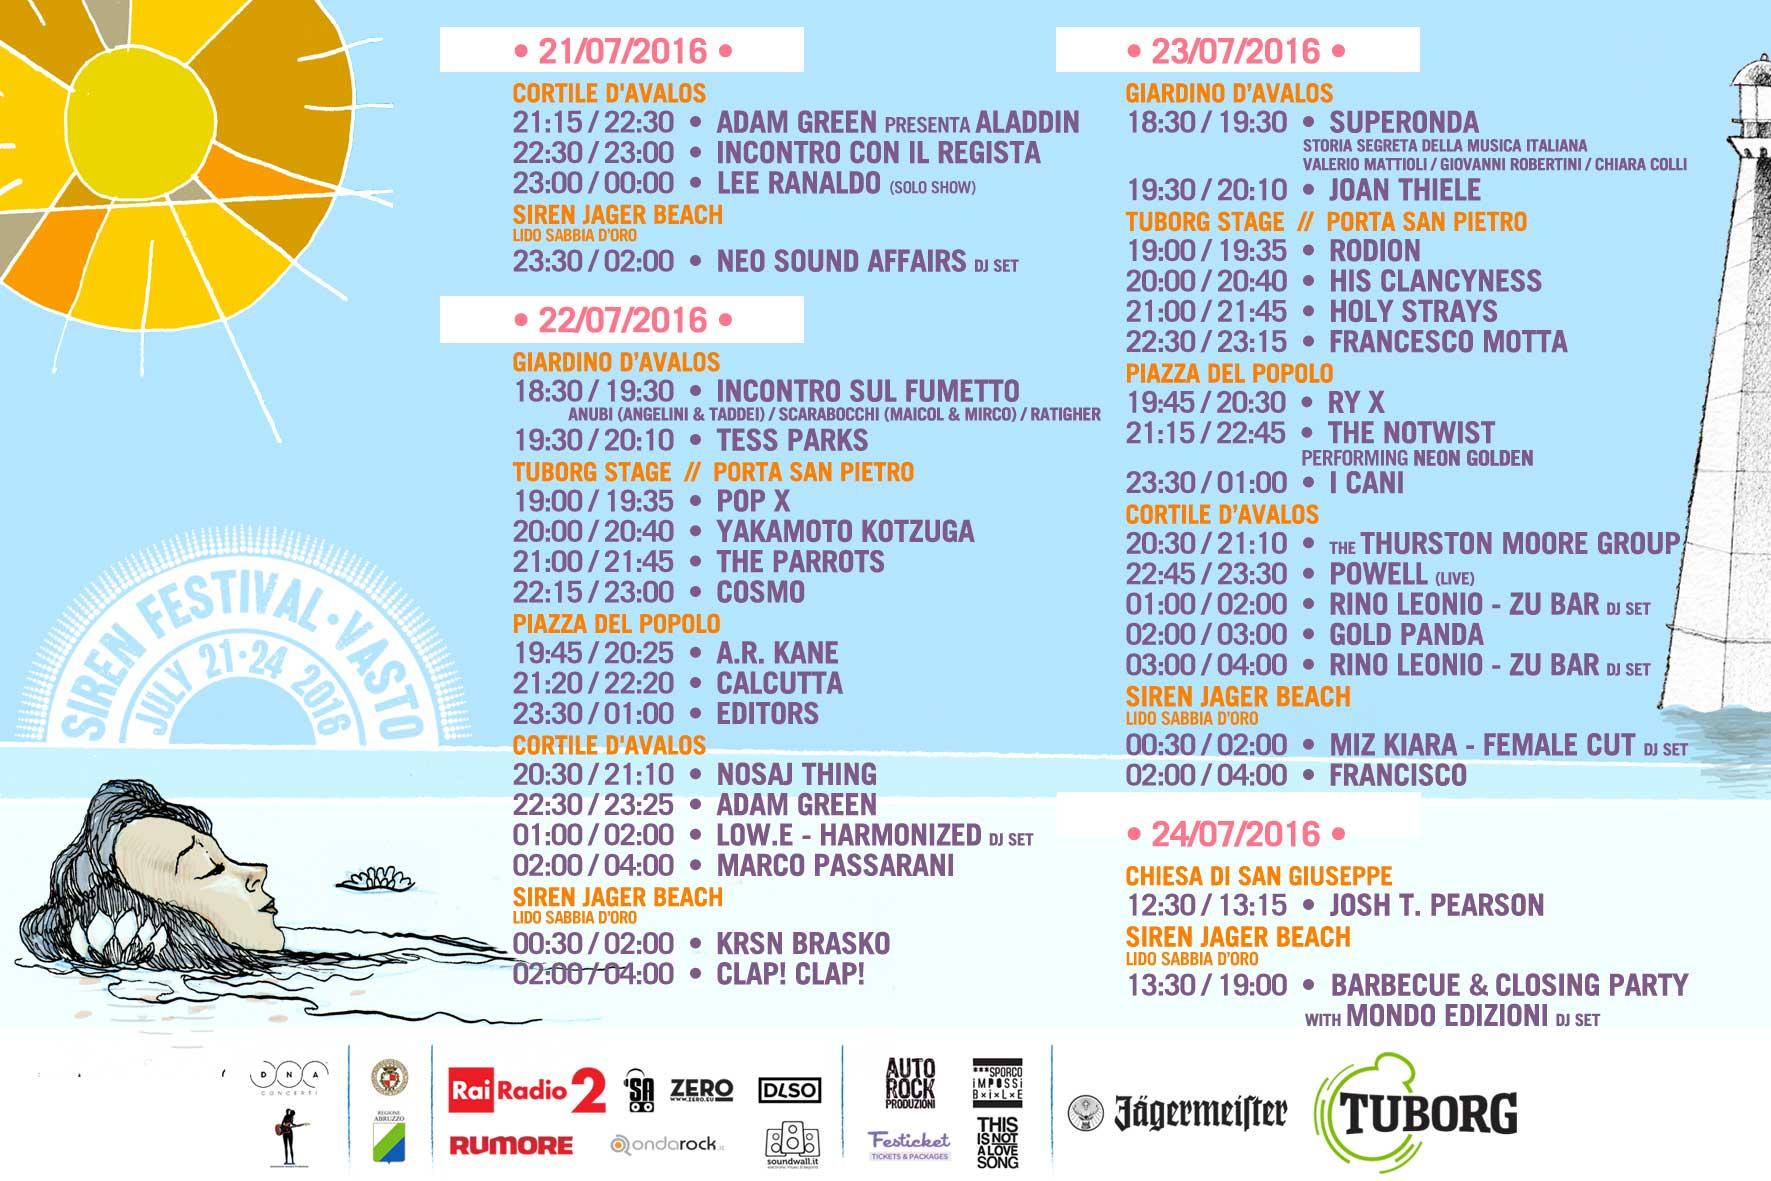 PROGRAMMA-SIREN FESTIVAL 2016